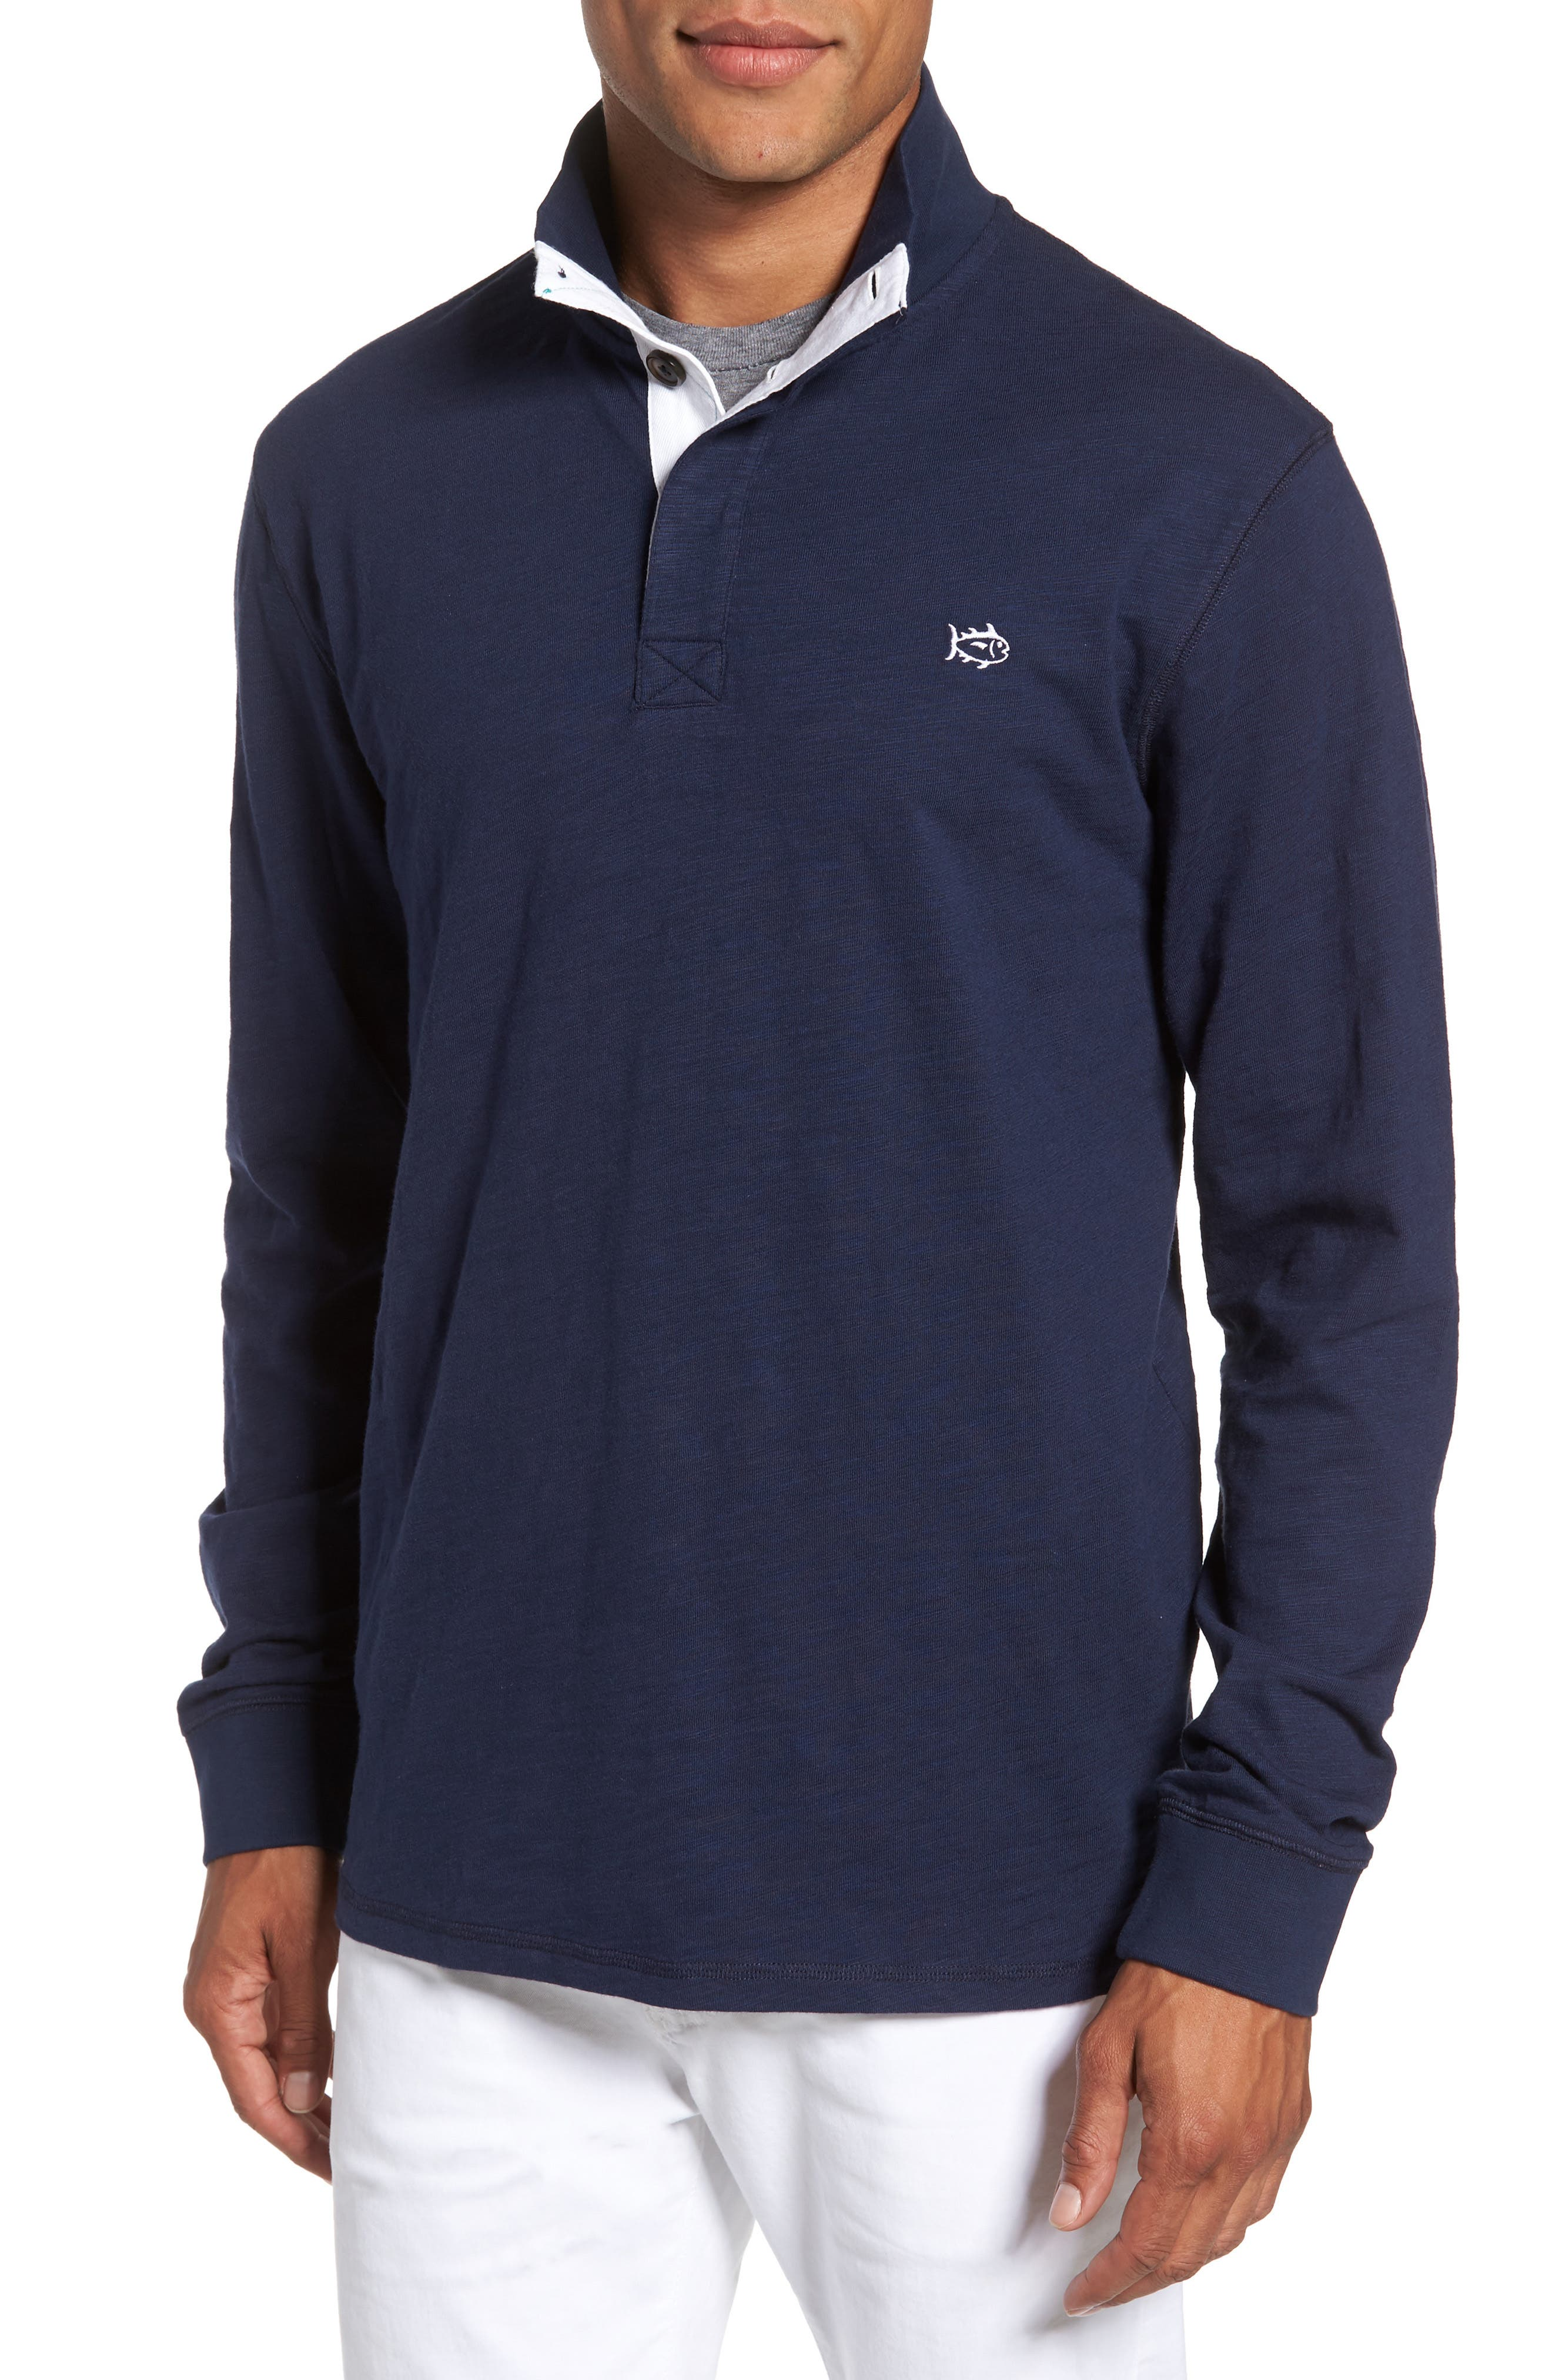 Gulf Stream Sweatshirt,                         Main,                         color, 408